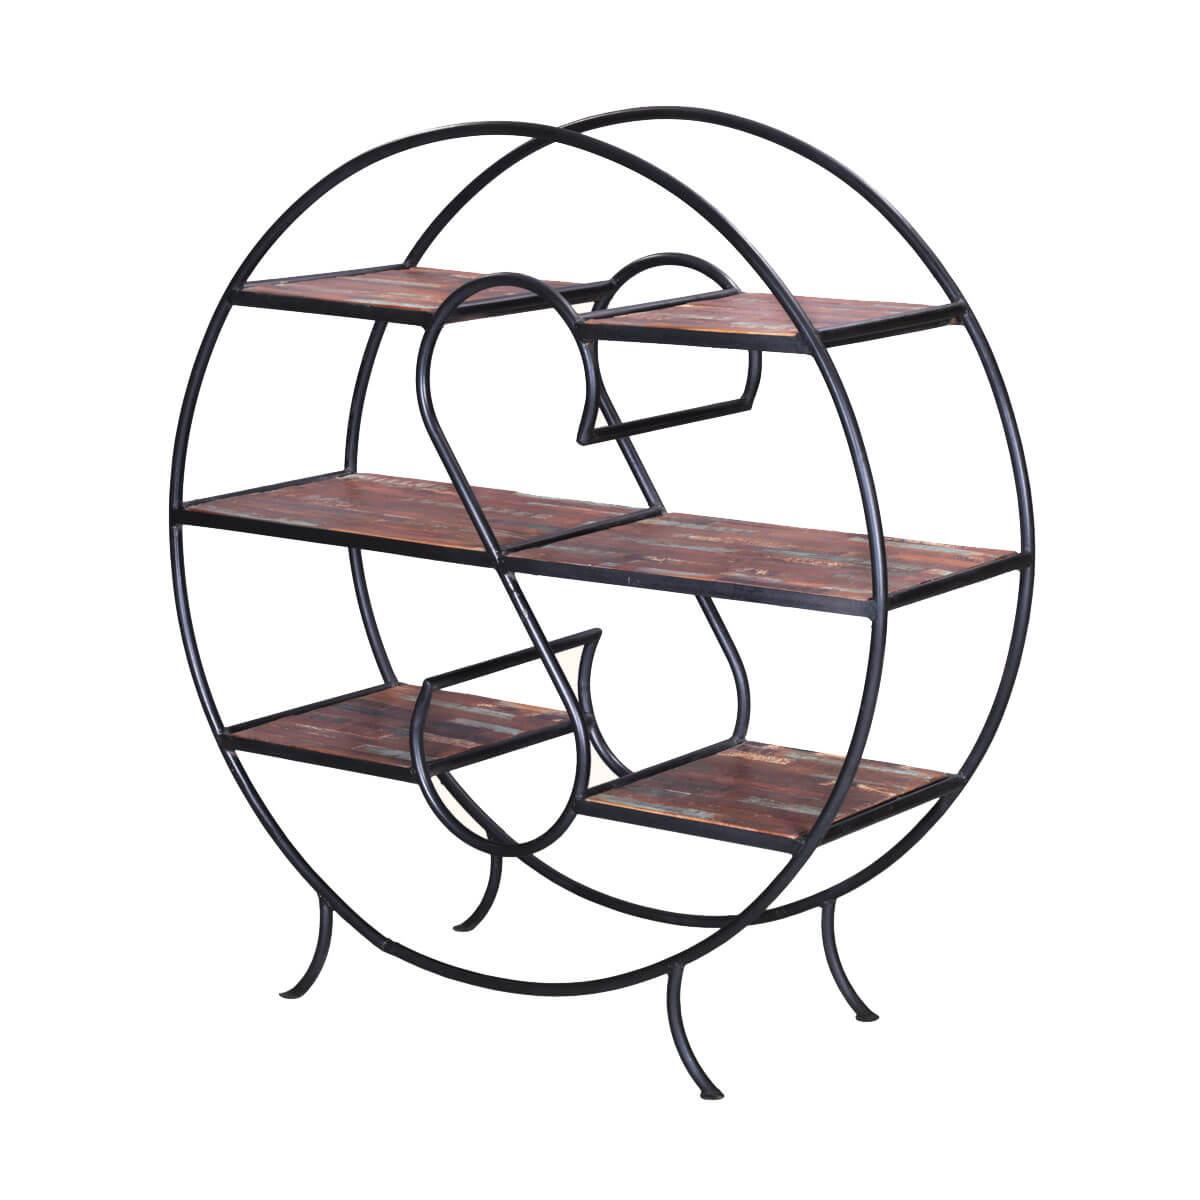 Napa Valley Reclaimed Wood & Iron Oval 3-Tier Display Shelf